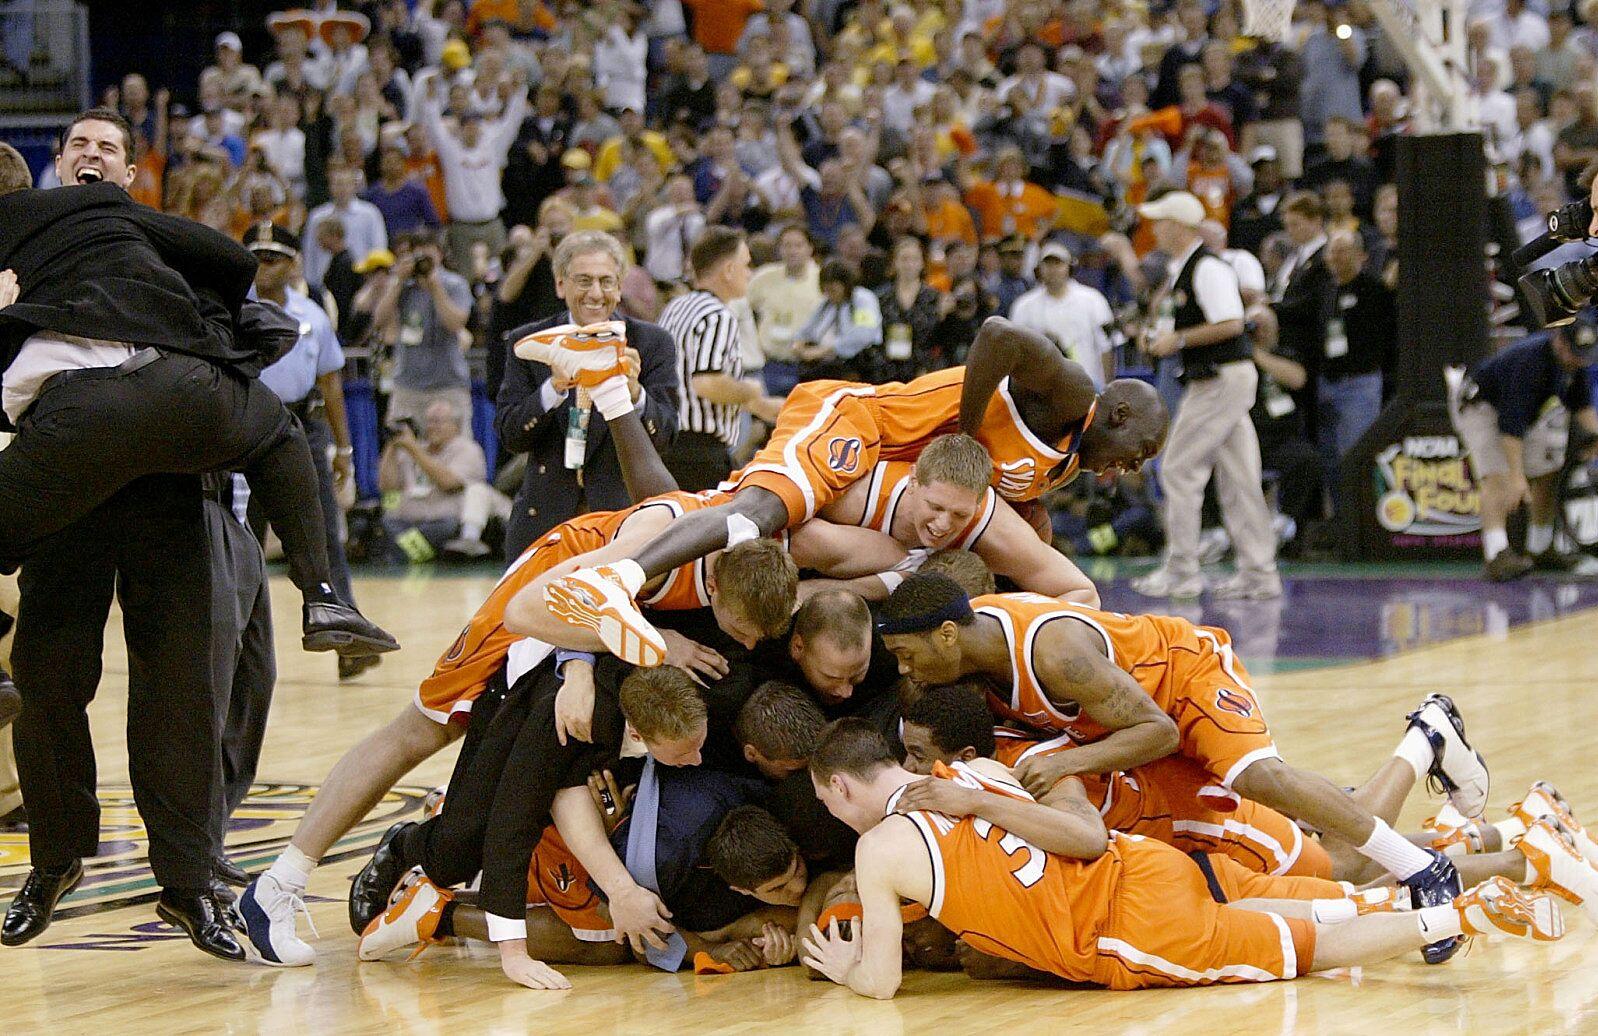 Syracuse Basketball Legends Series: Inside look at Hakim Warrick